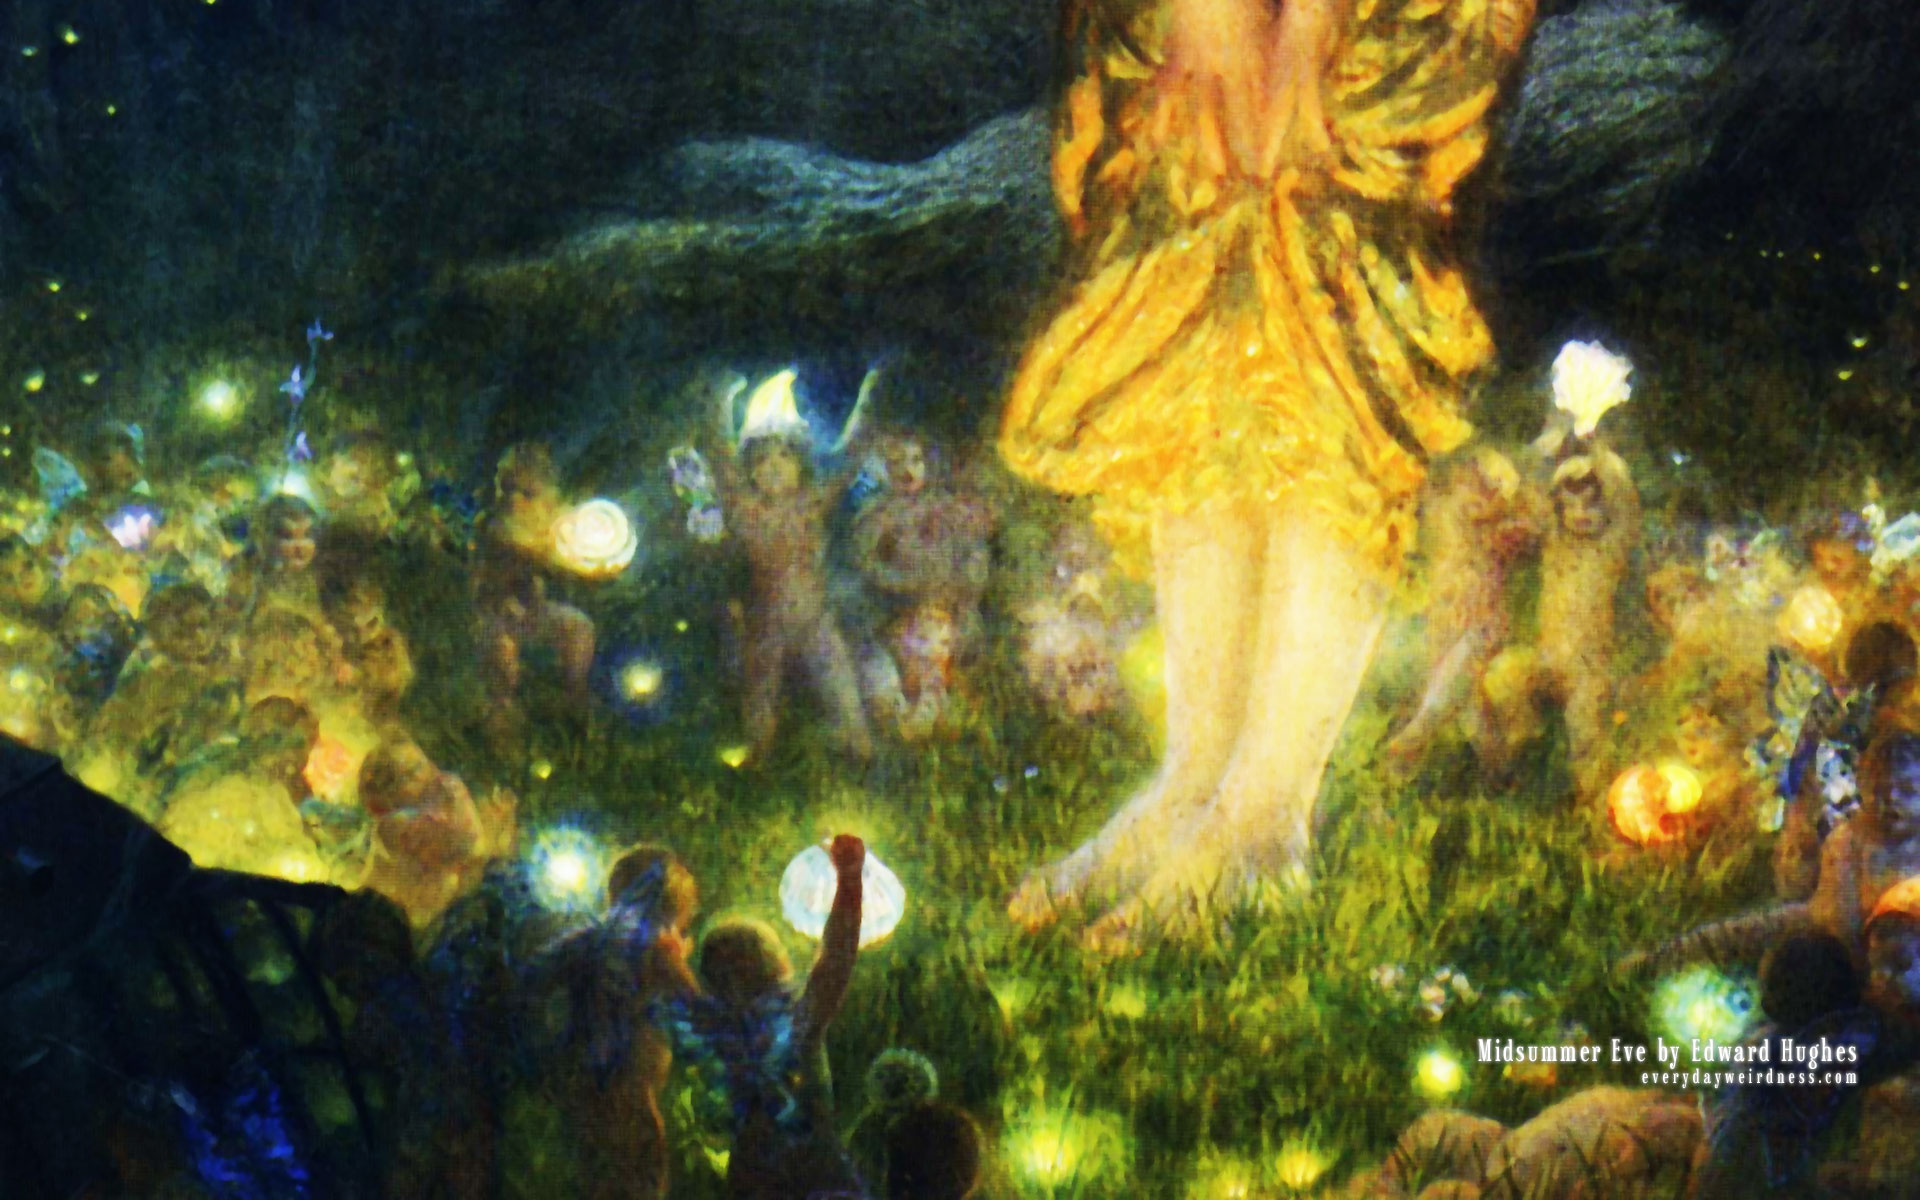 Midsummer Eve by Edward Hughes - Everyday Weirdness (June 20th 2009)